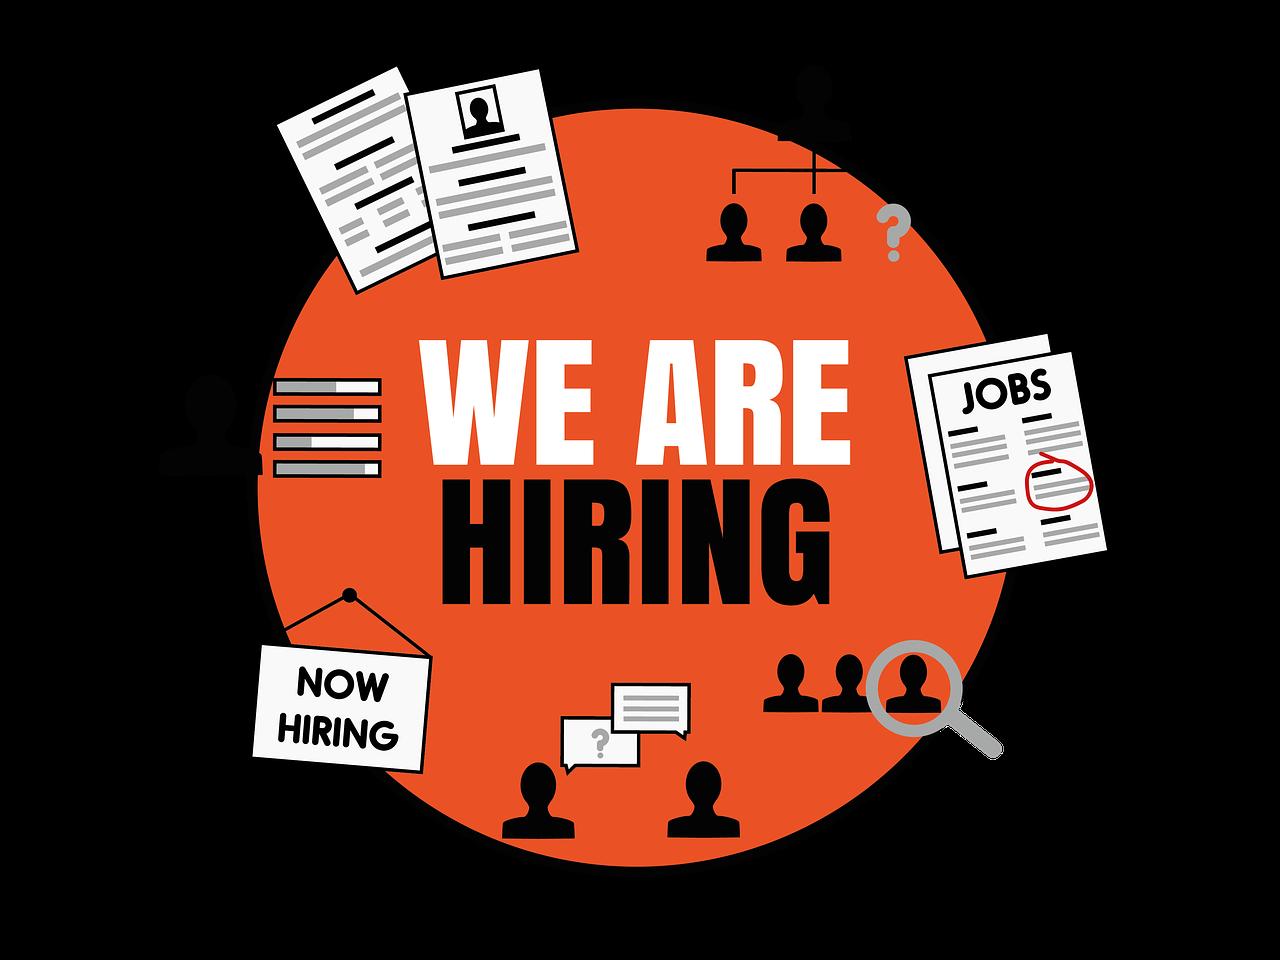 hiring-4074021_1280.png